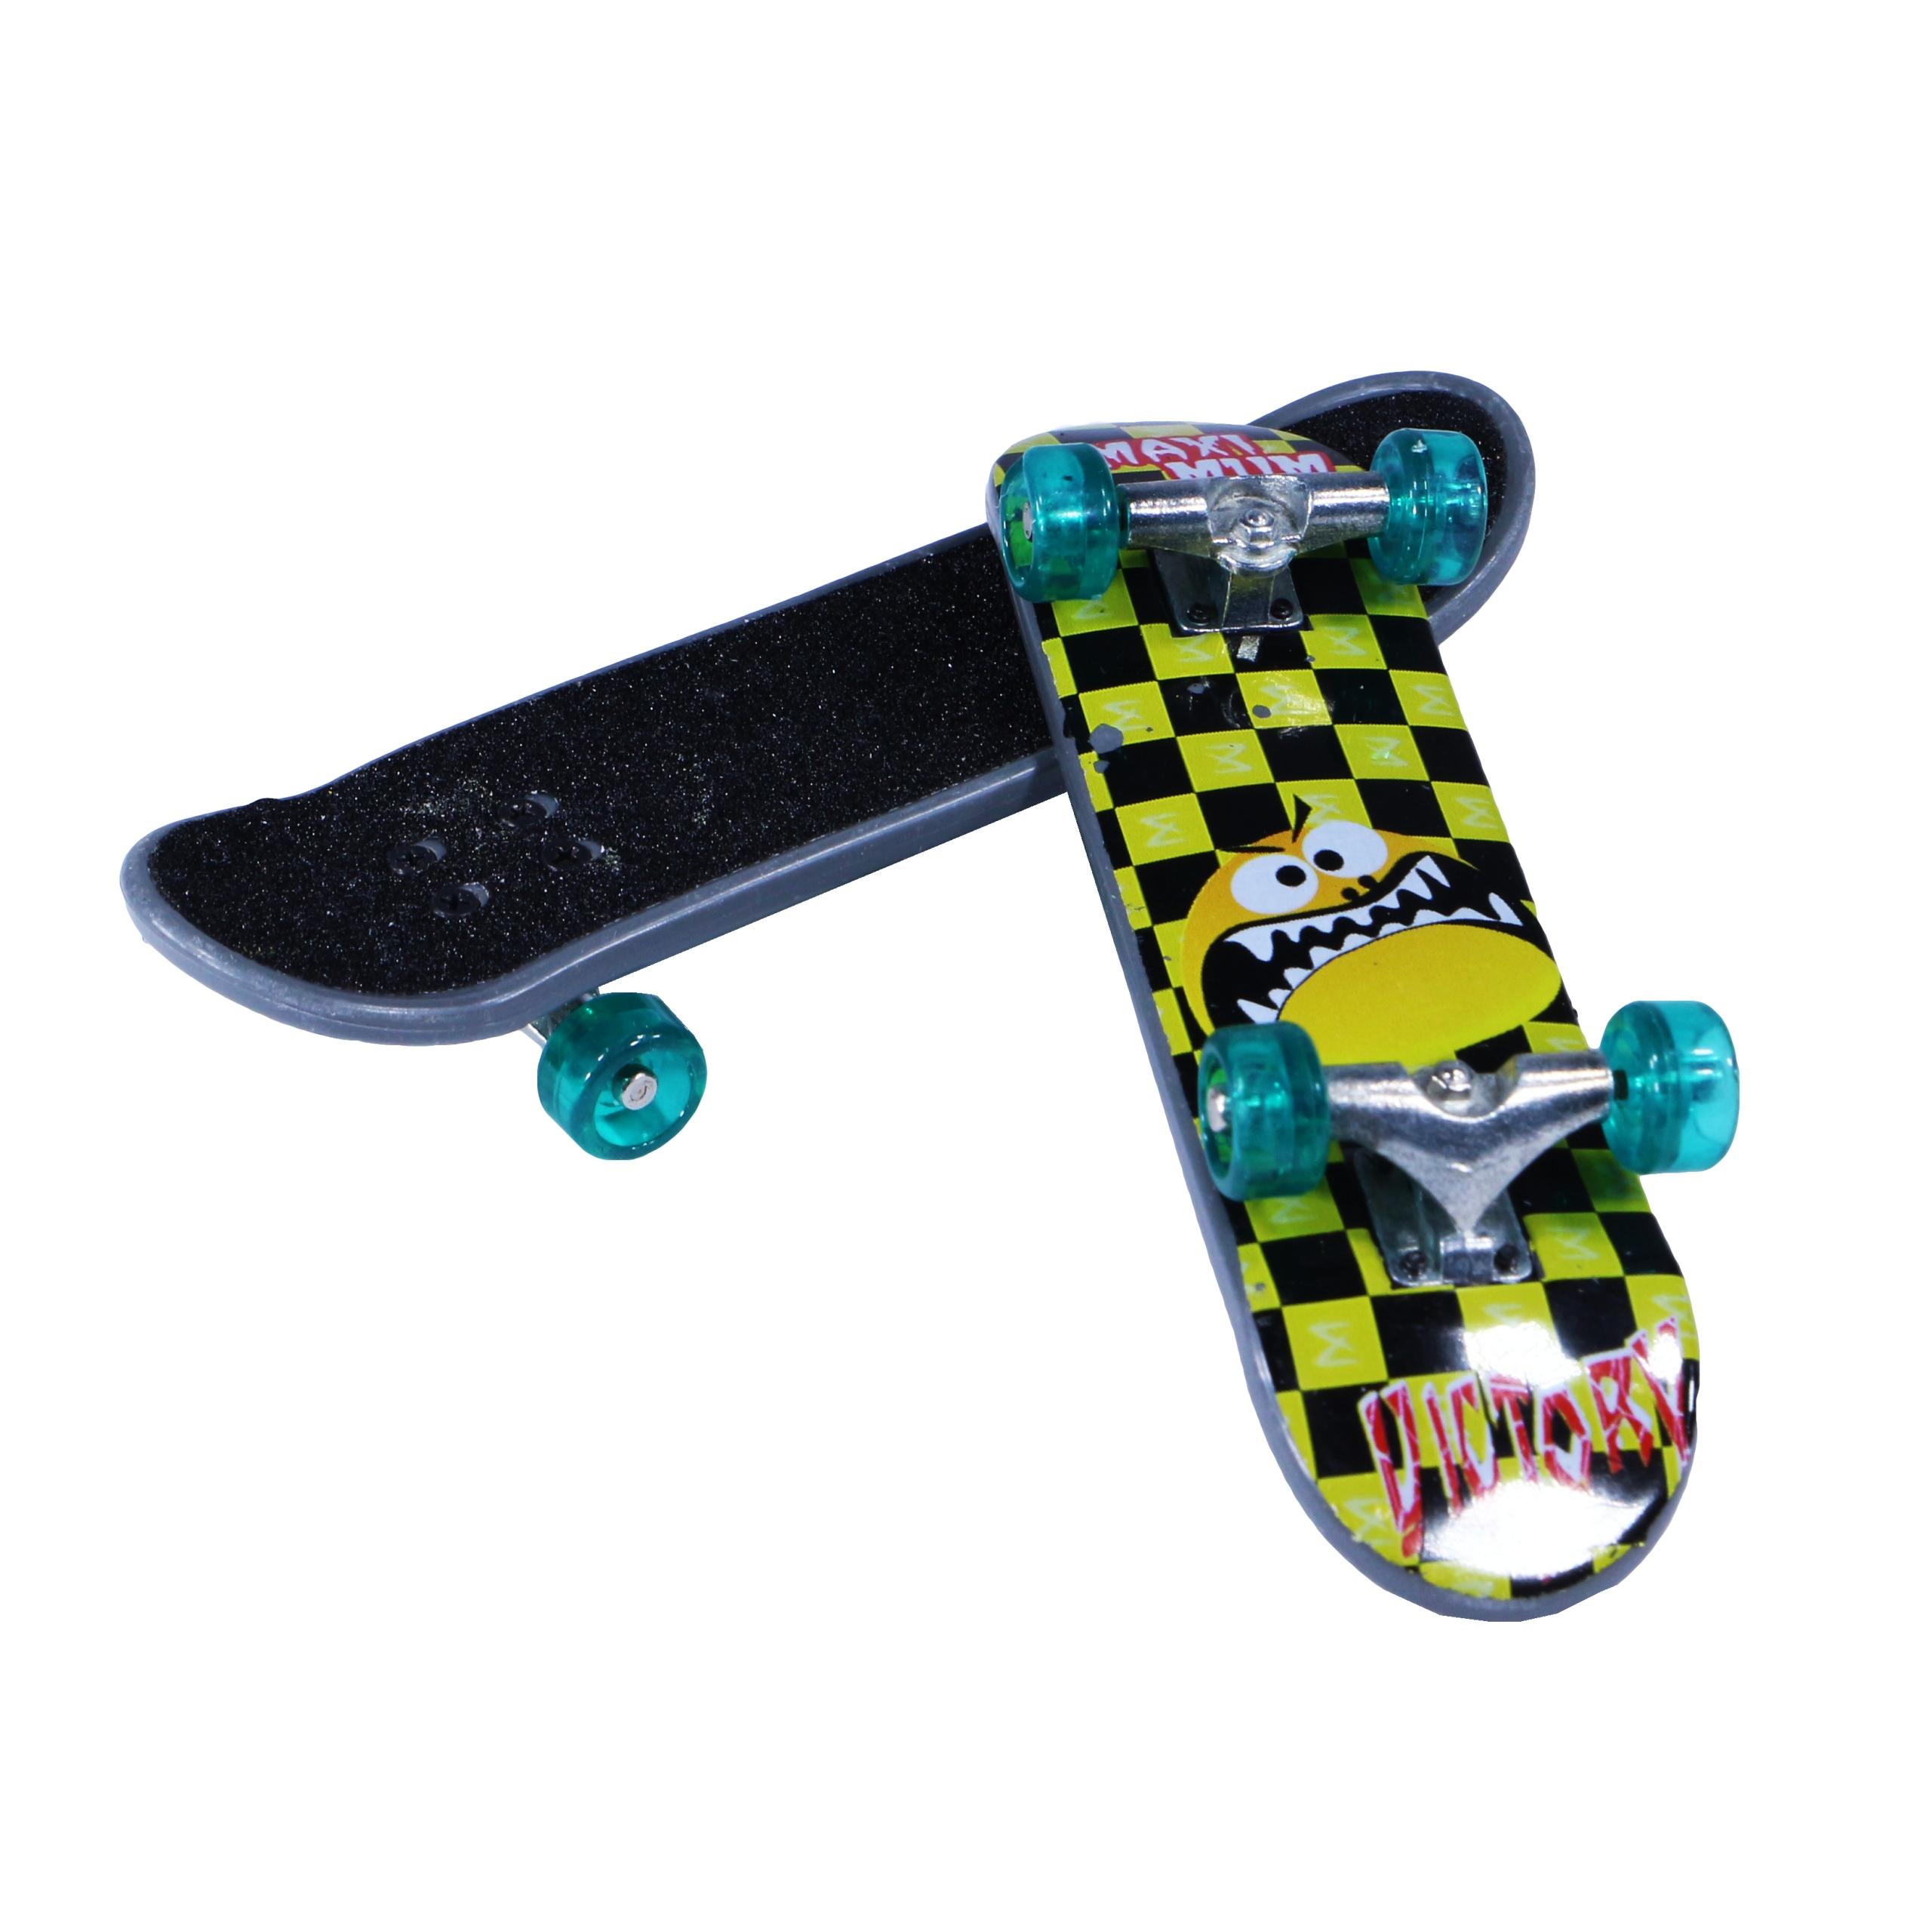 Zestaw Mini Fingerboard Deskorolka 3szt + Kartonik Kod producenta 111269